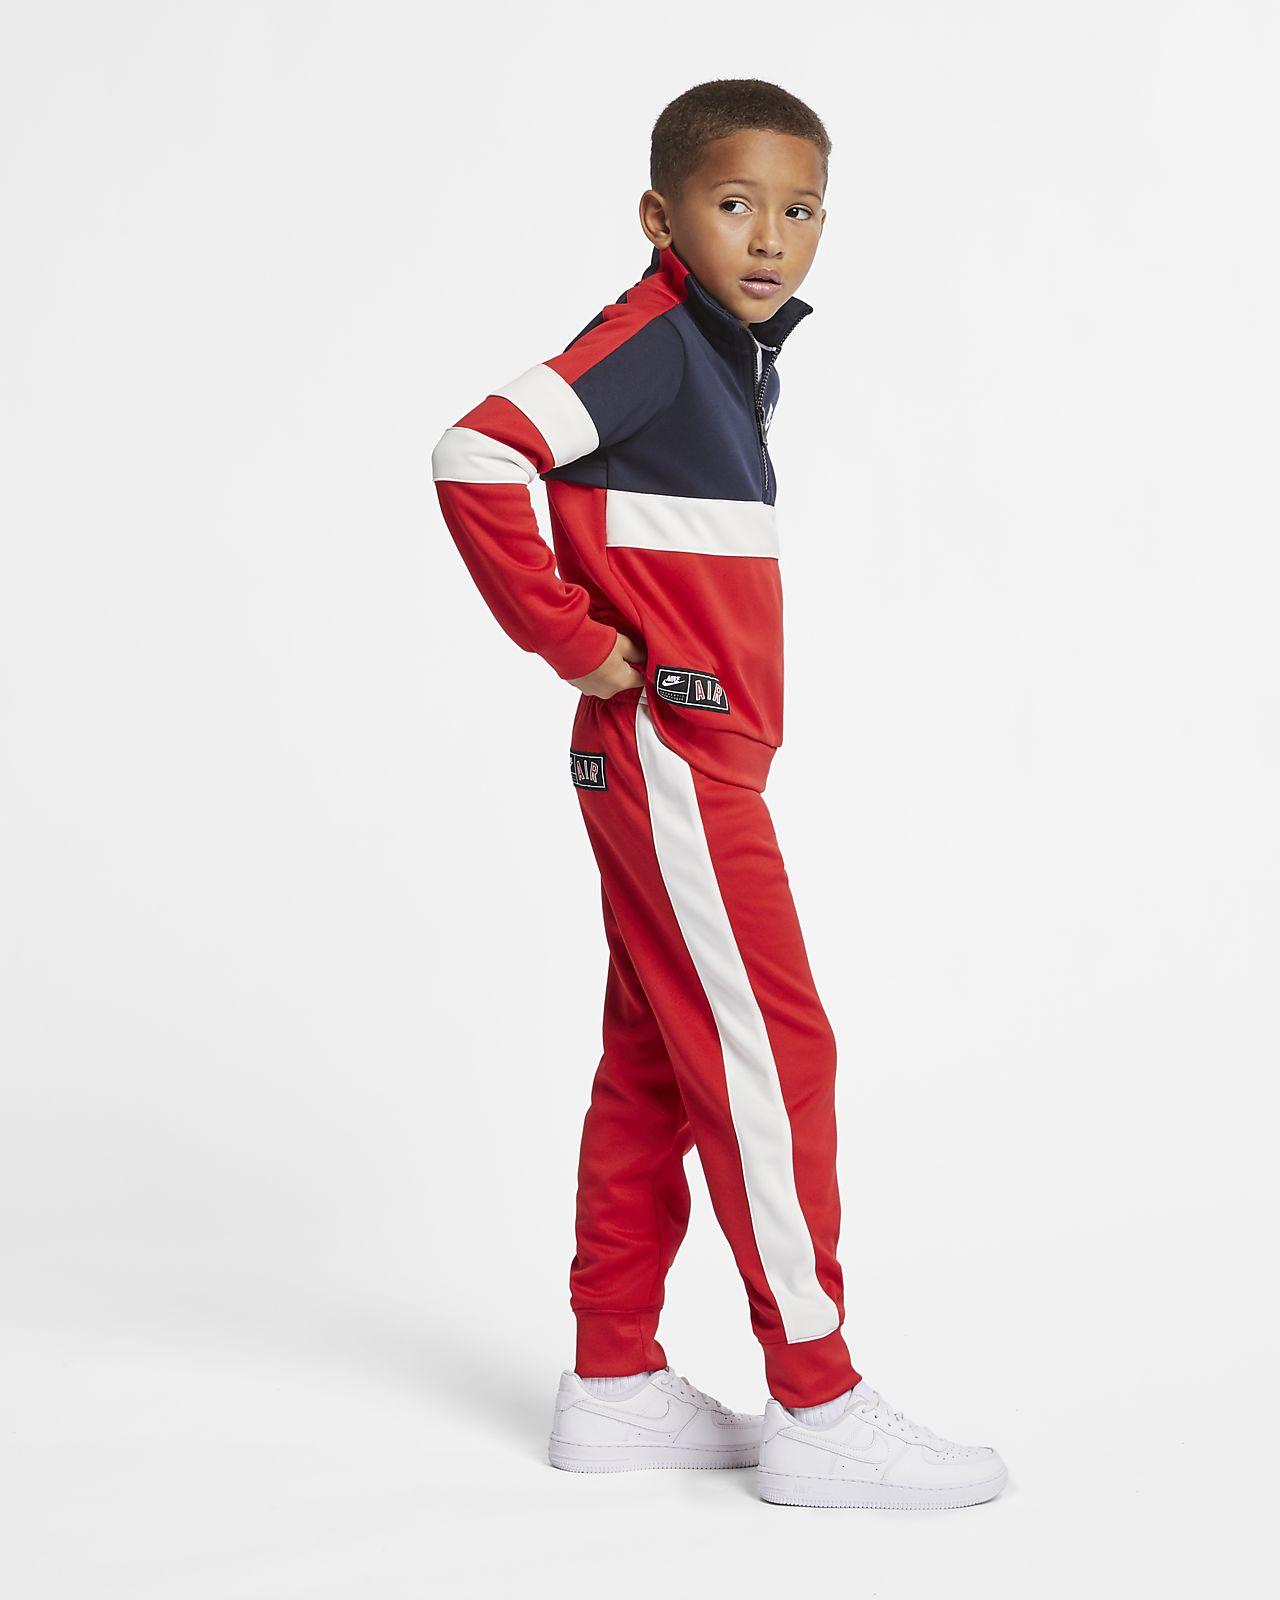 Nike Air Conjunt de dues peces - Nen/a petit/a